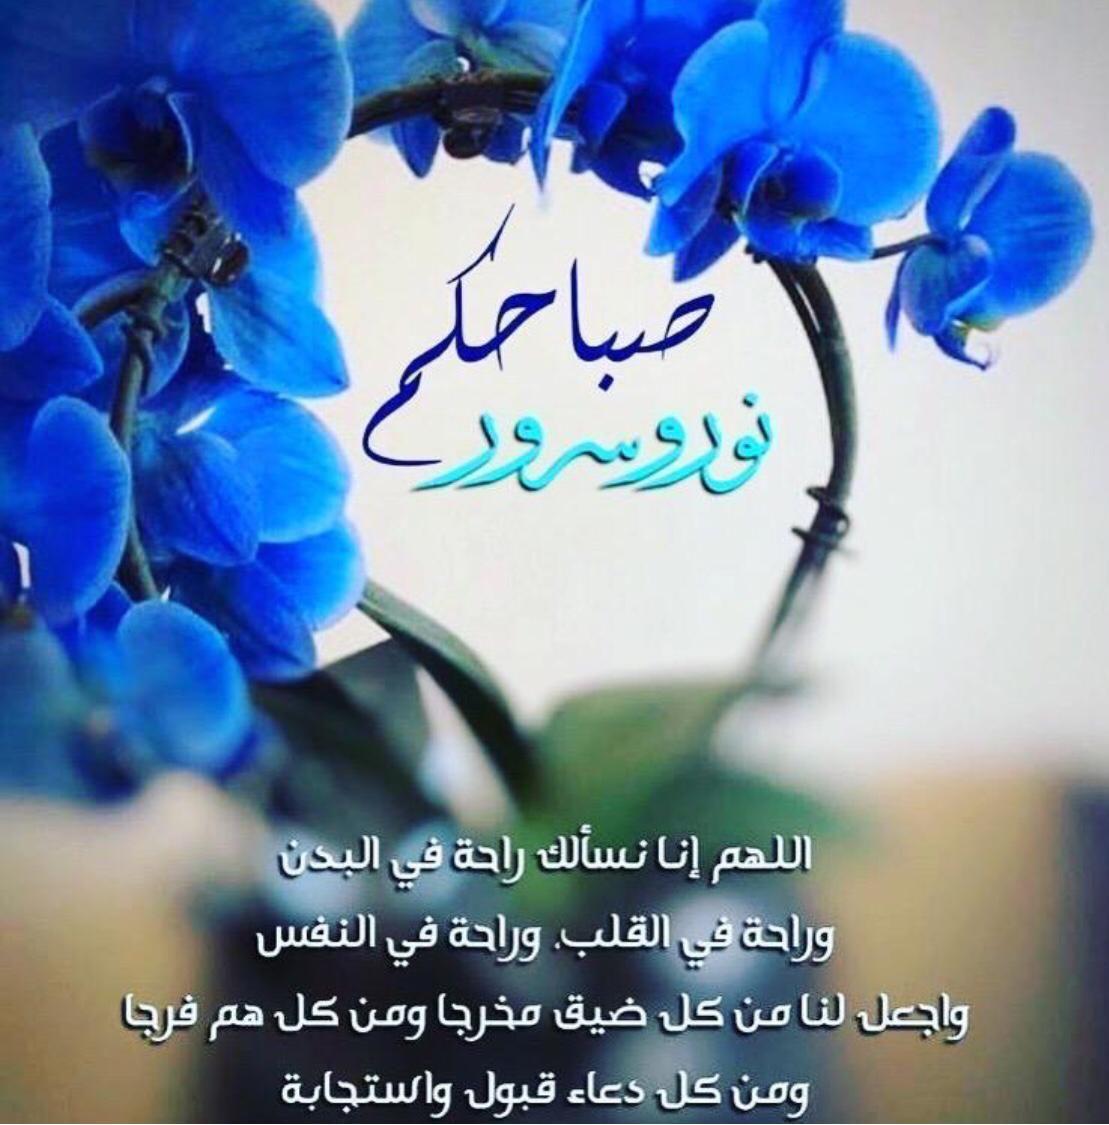 Pin By Sosi On صباحي بكم أجمل Good Morning Messages Good Morning Flowers Good Morning Arabic